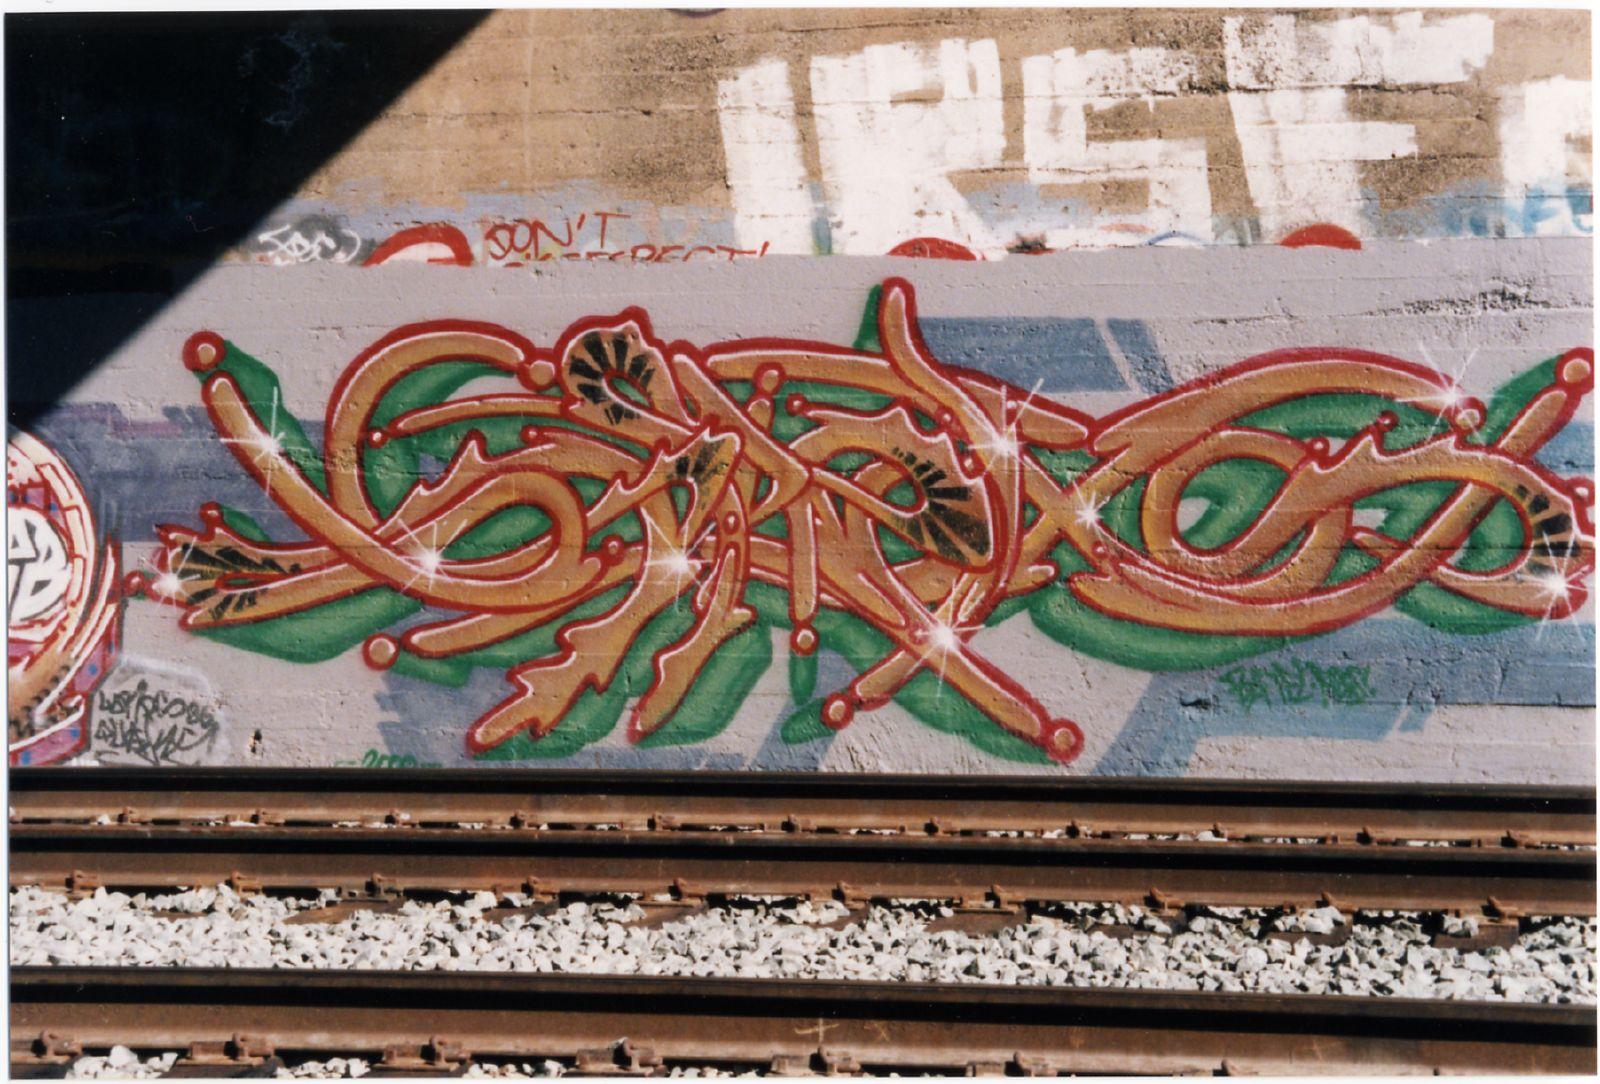 Artwork By Apex in San Francisco